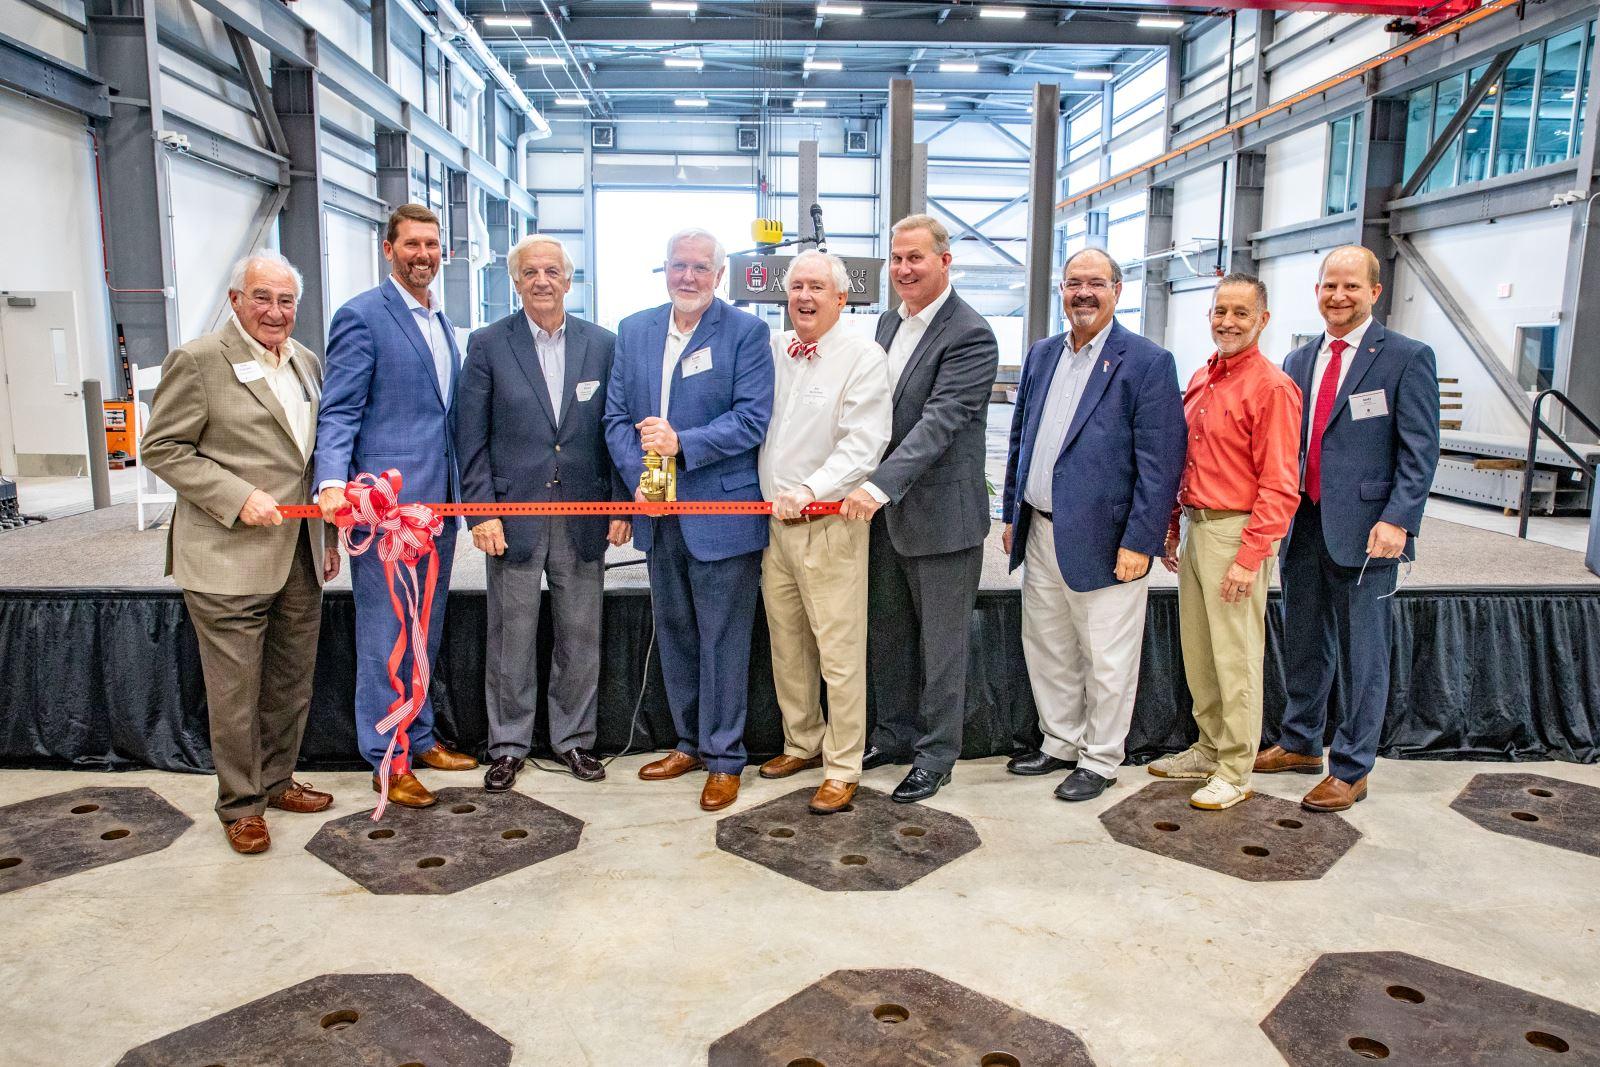 (Left to right) Gus Vratsinas, Scott Bennett, Dan Flowers, Grady Harvell, Jim McClelland, John Burkhalter, Bert Parker, Dan Williams and Andy Davis